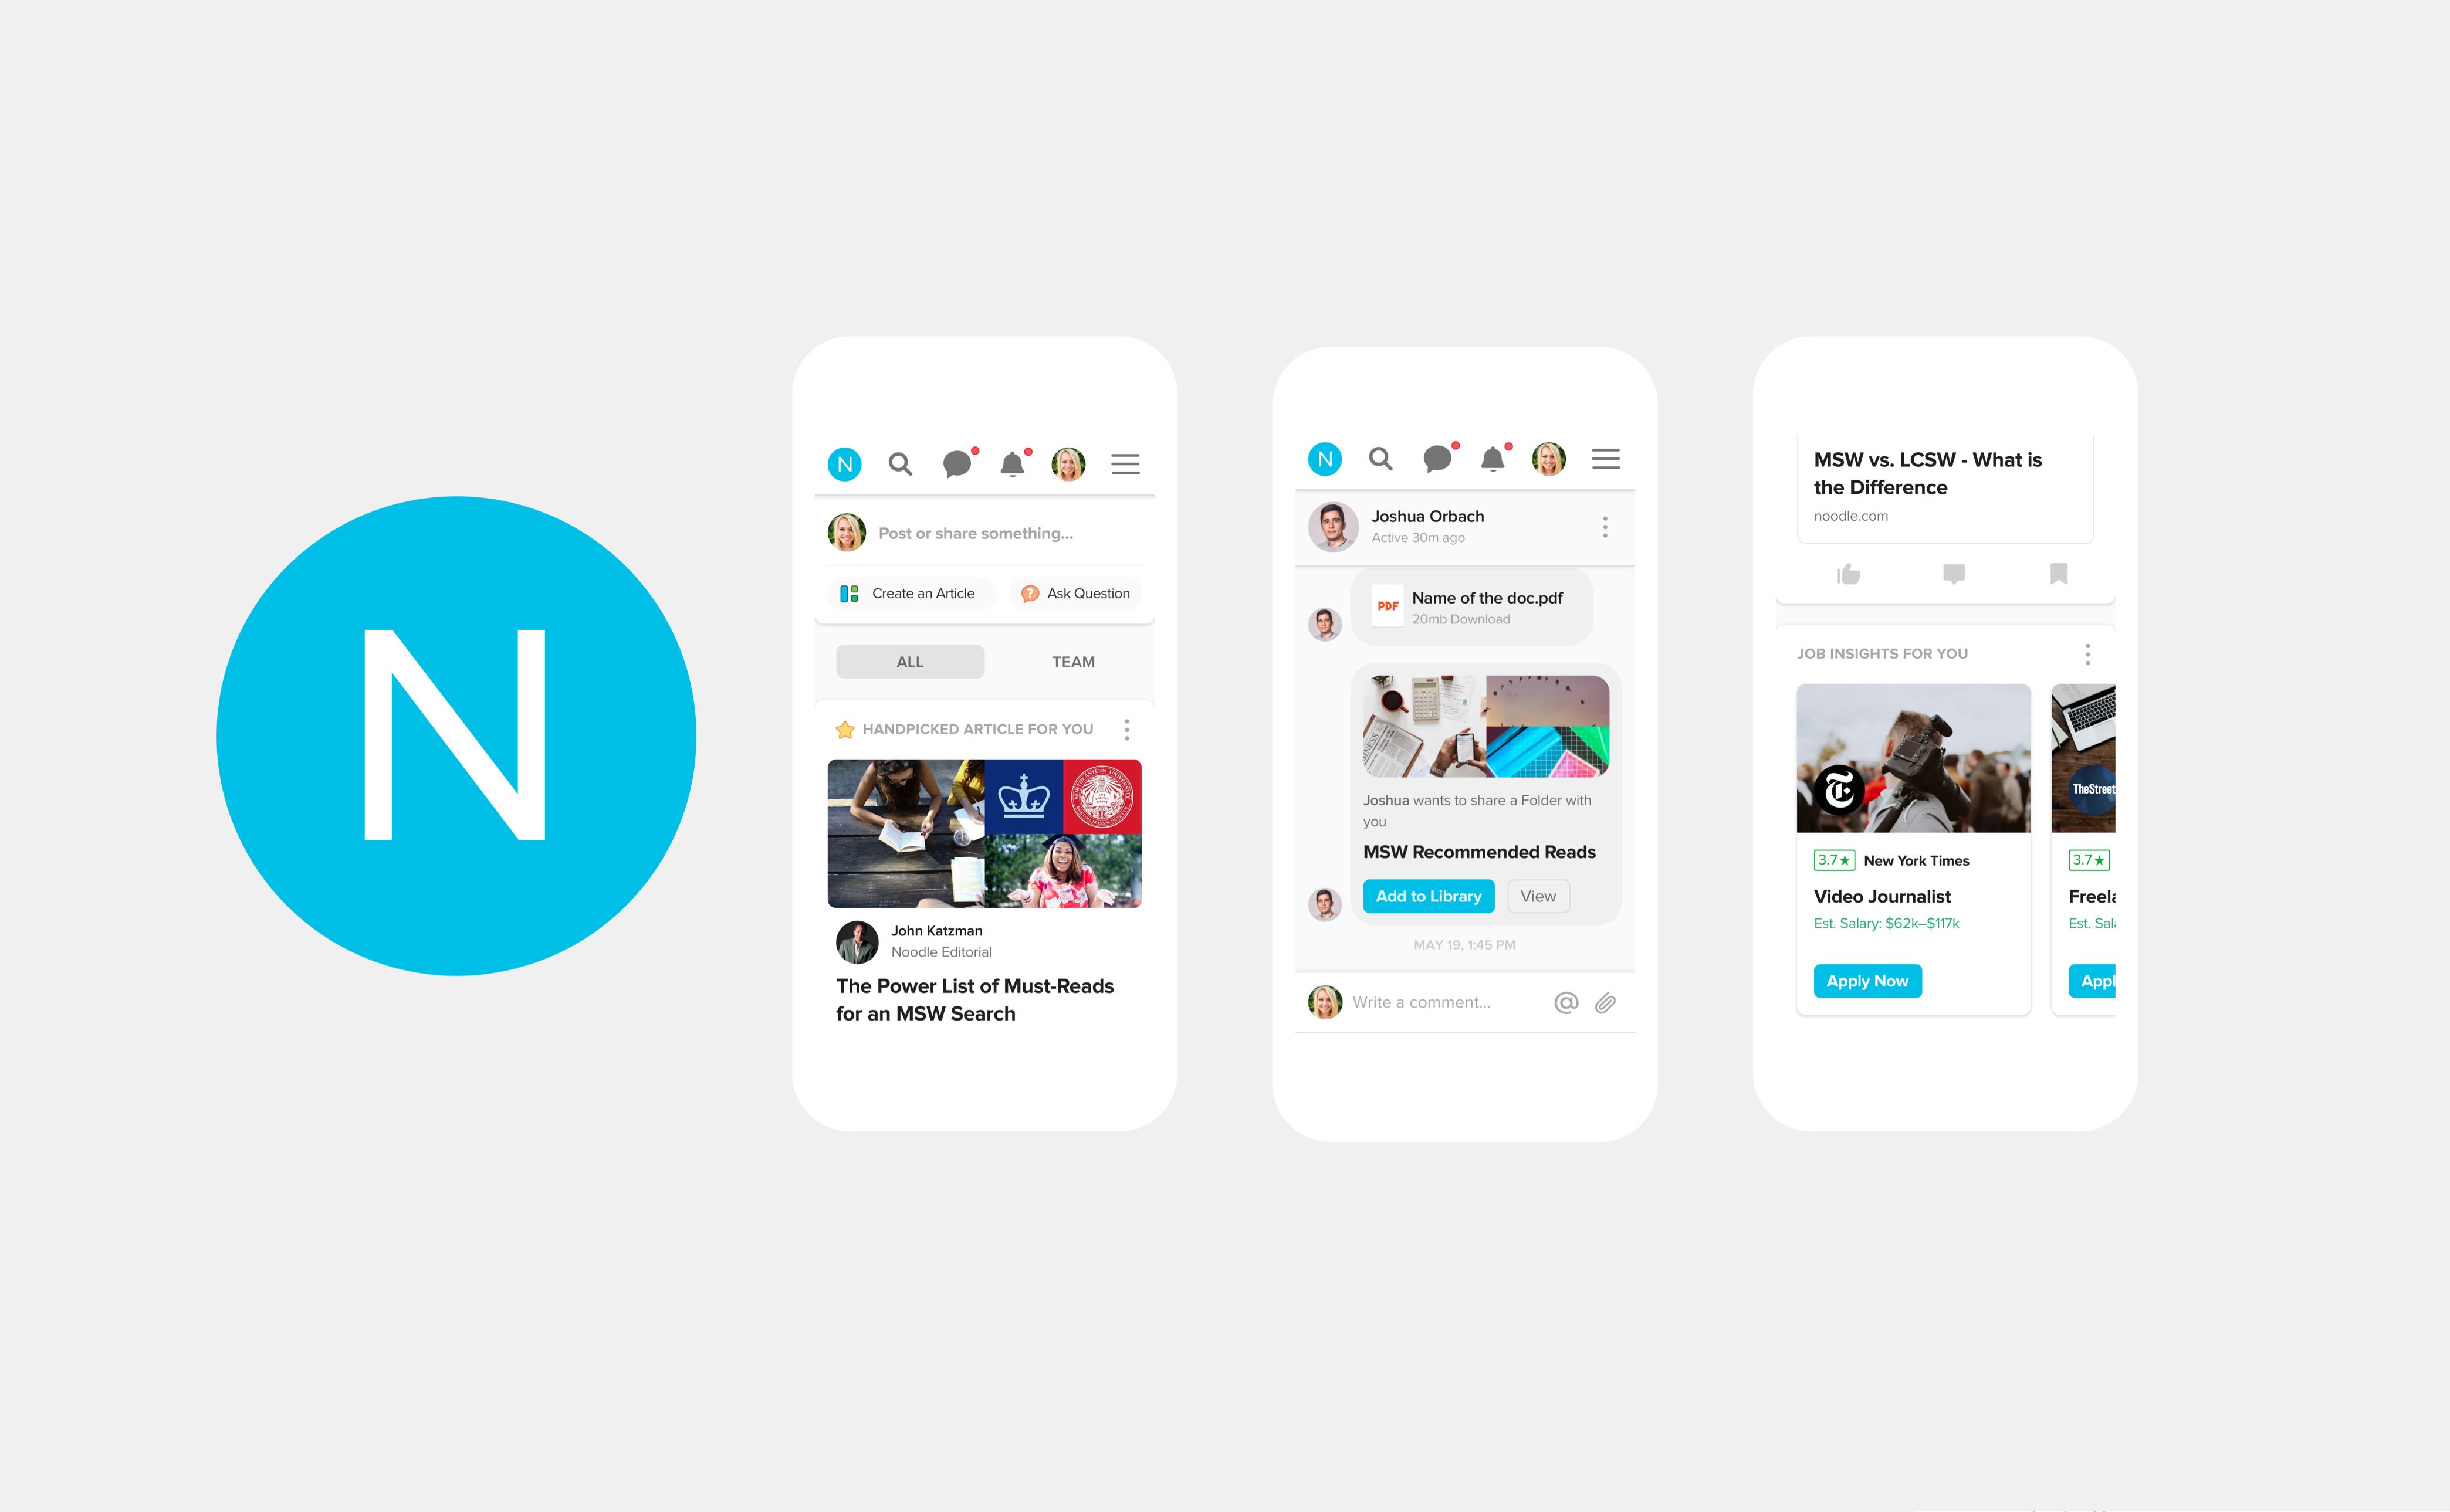 Noodle Education responsive mobile web design by RocketAir